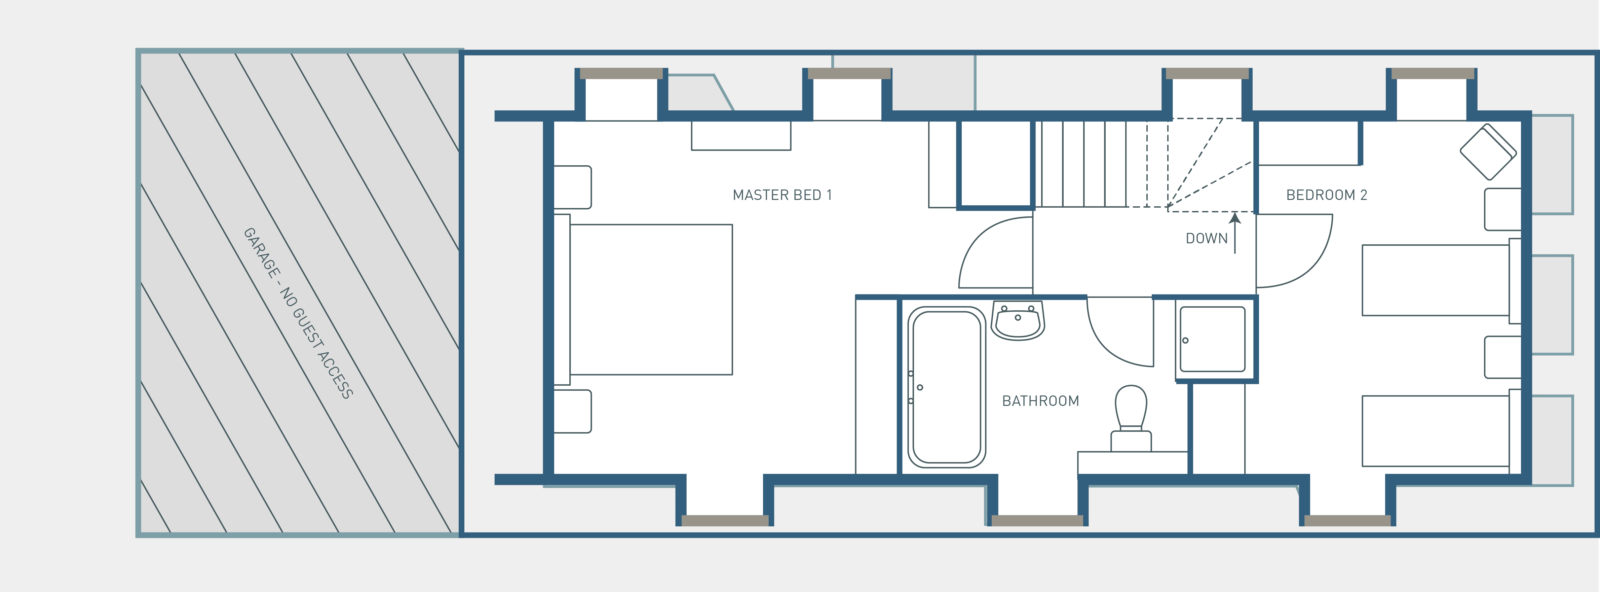 Floorplan_L2E